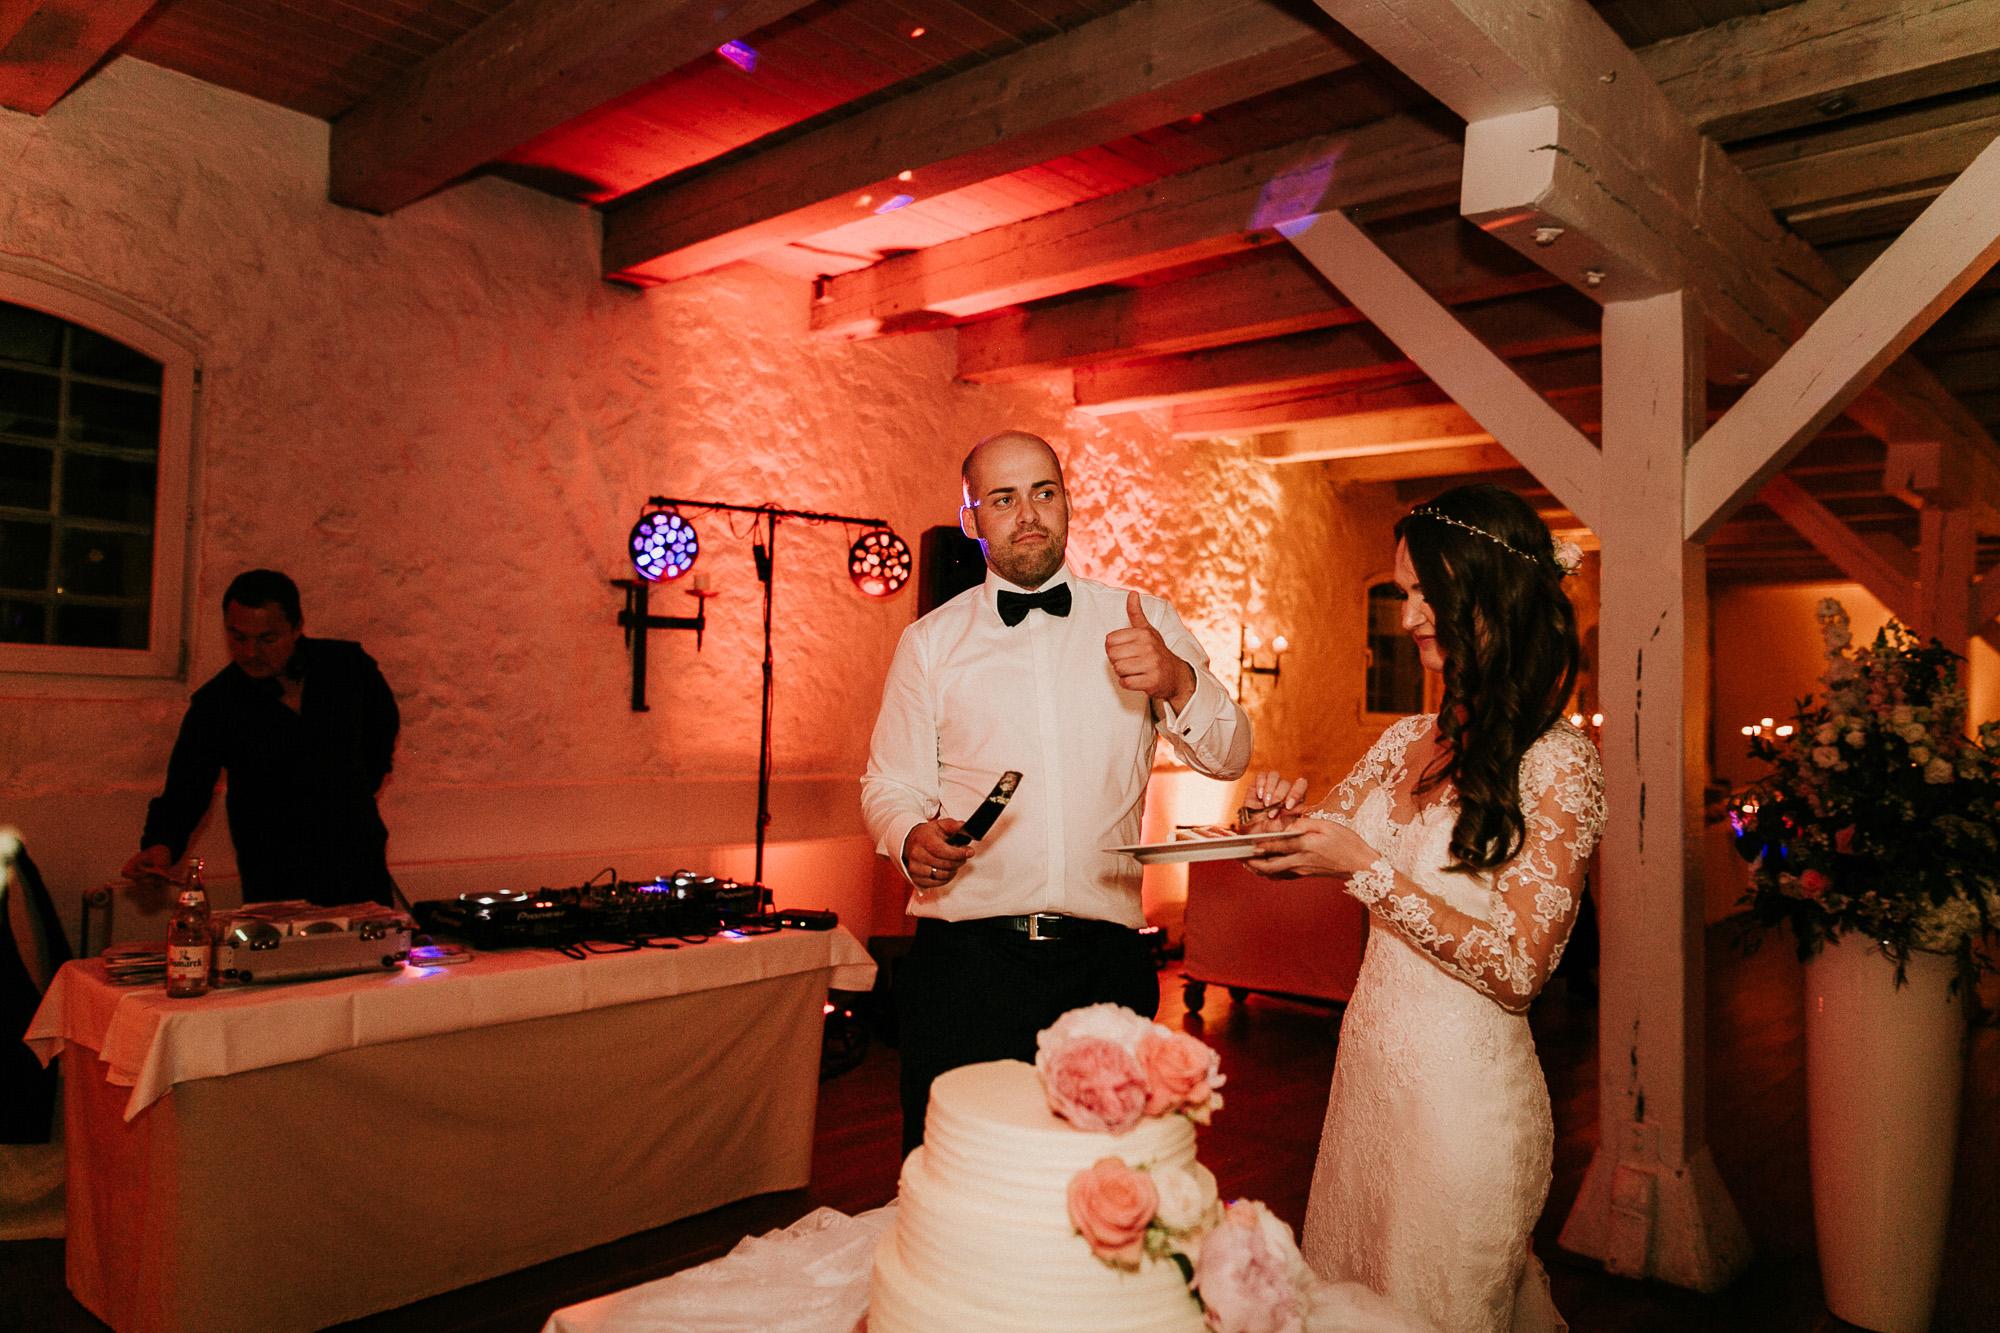 DanielaMarquardtPhotography_Hochzeitsfotograf_Düsseldorf_Köln_Mallorca_Bayern_Austria_Harz_Wedding_AileenundLennart_Weddingphotographer_Ibiza_Tuskany_Italien_Toskana_Portugal_Lissabon289